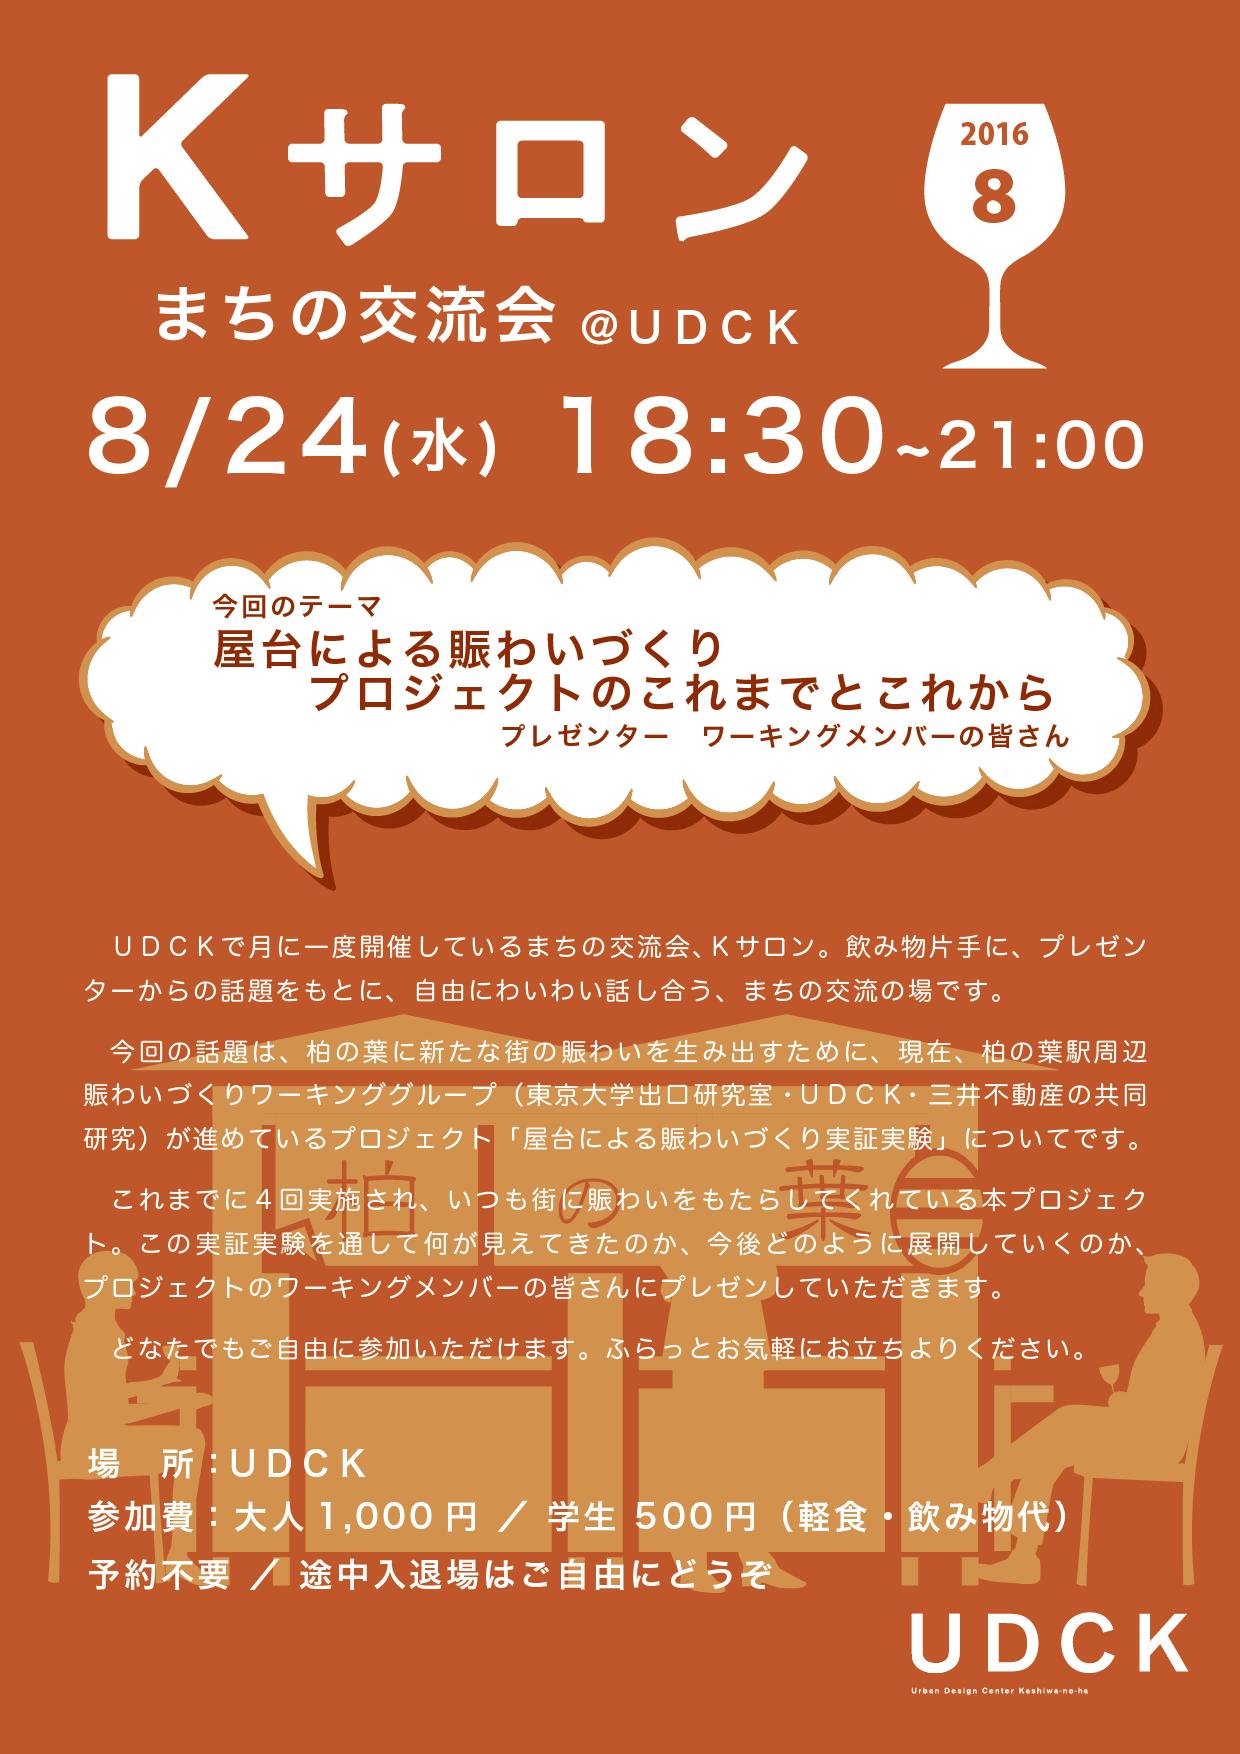 http://www.udck.jp/event/2016_8_Ksalon-01.png